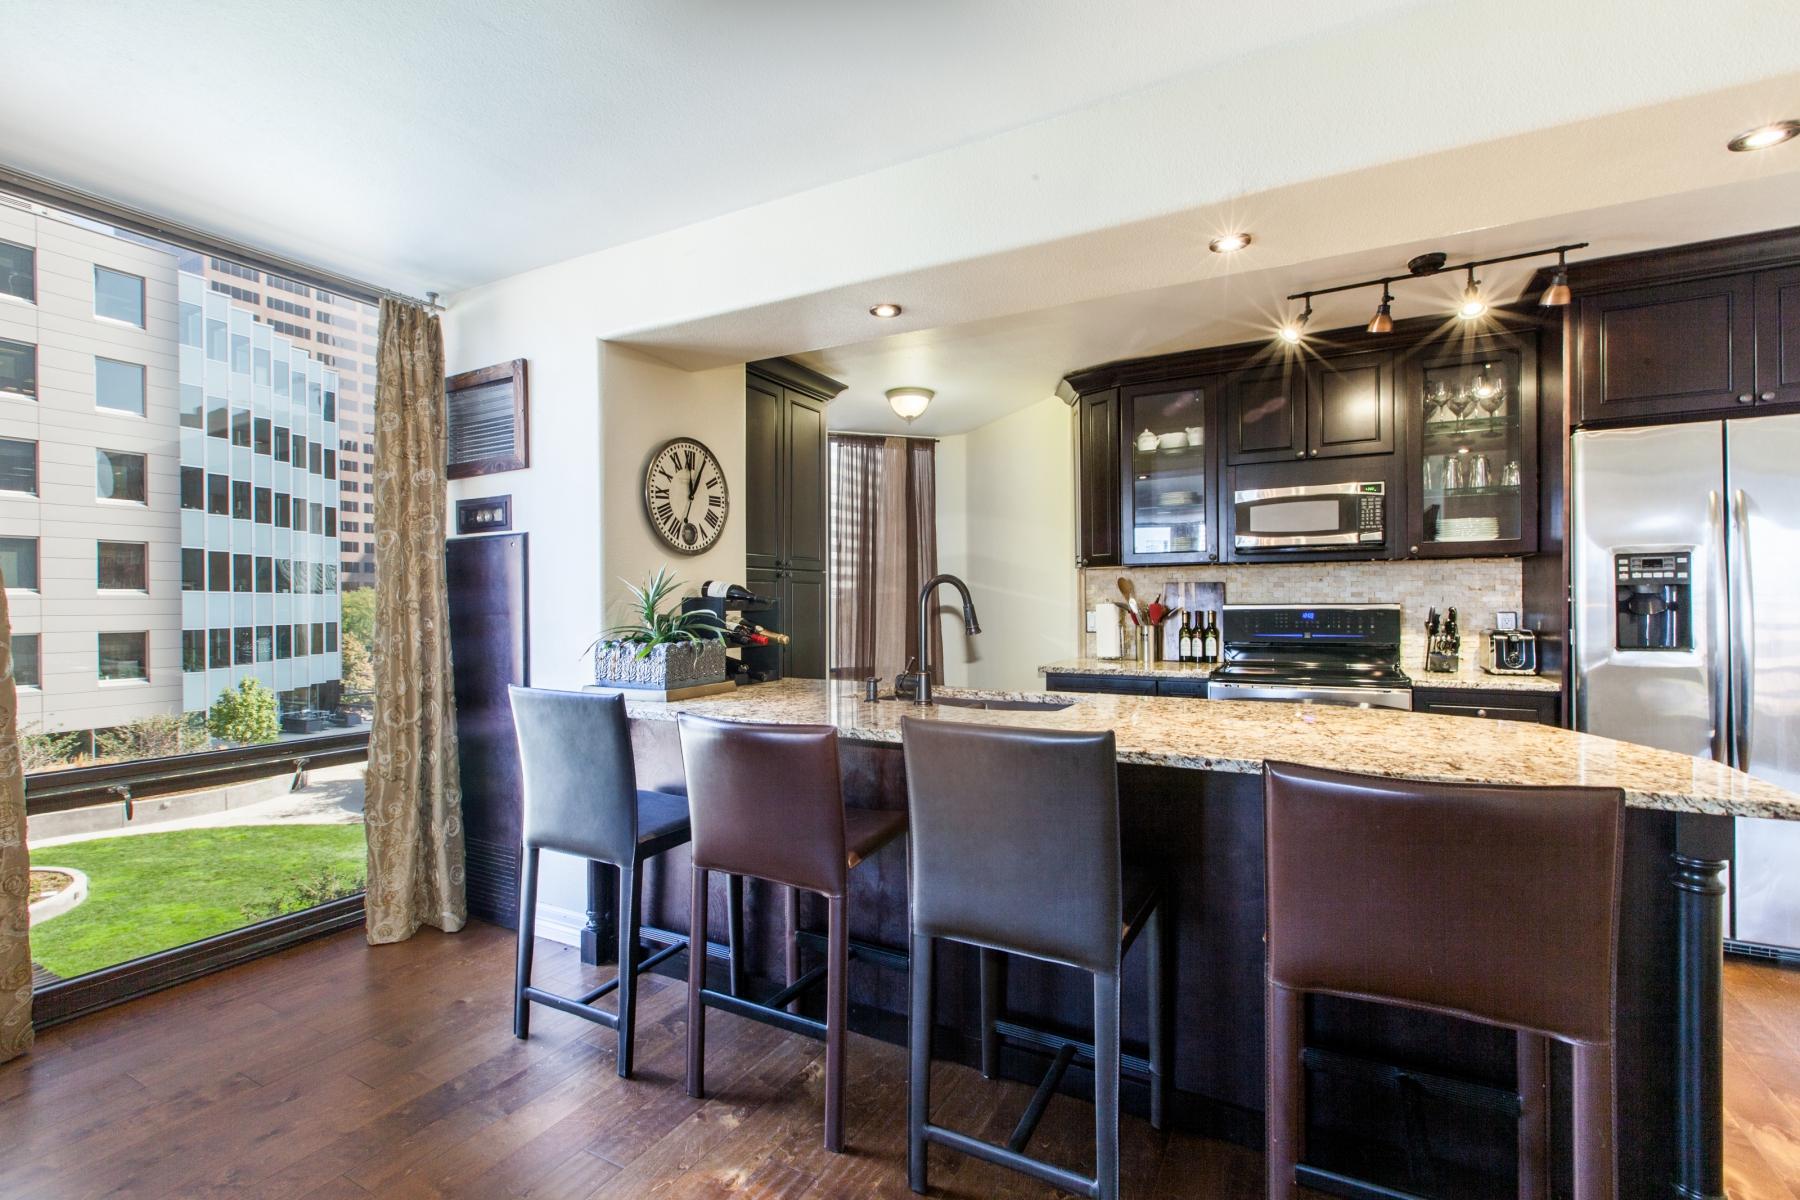 Property For Sale at 1625 Larimer Street #507